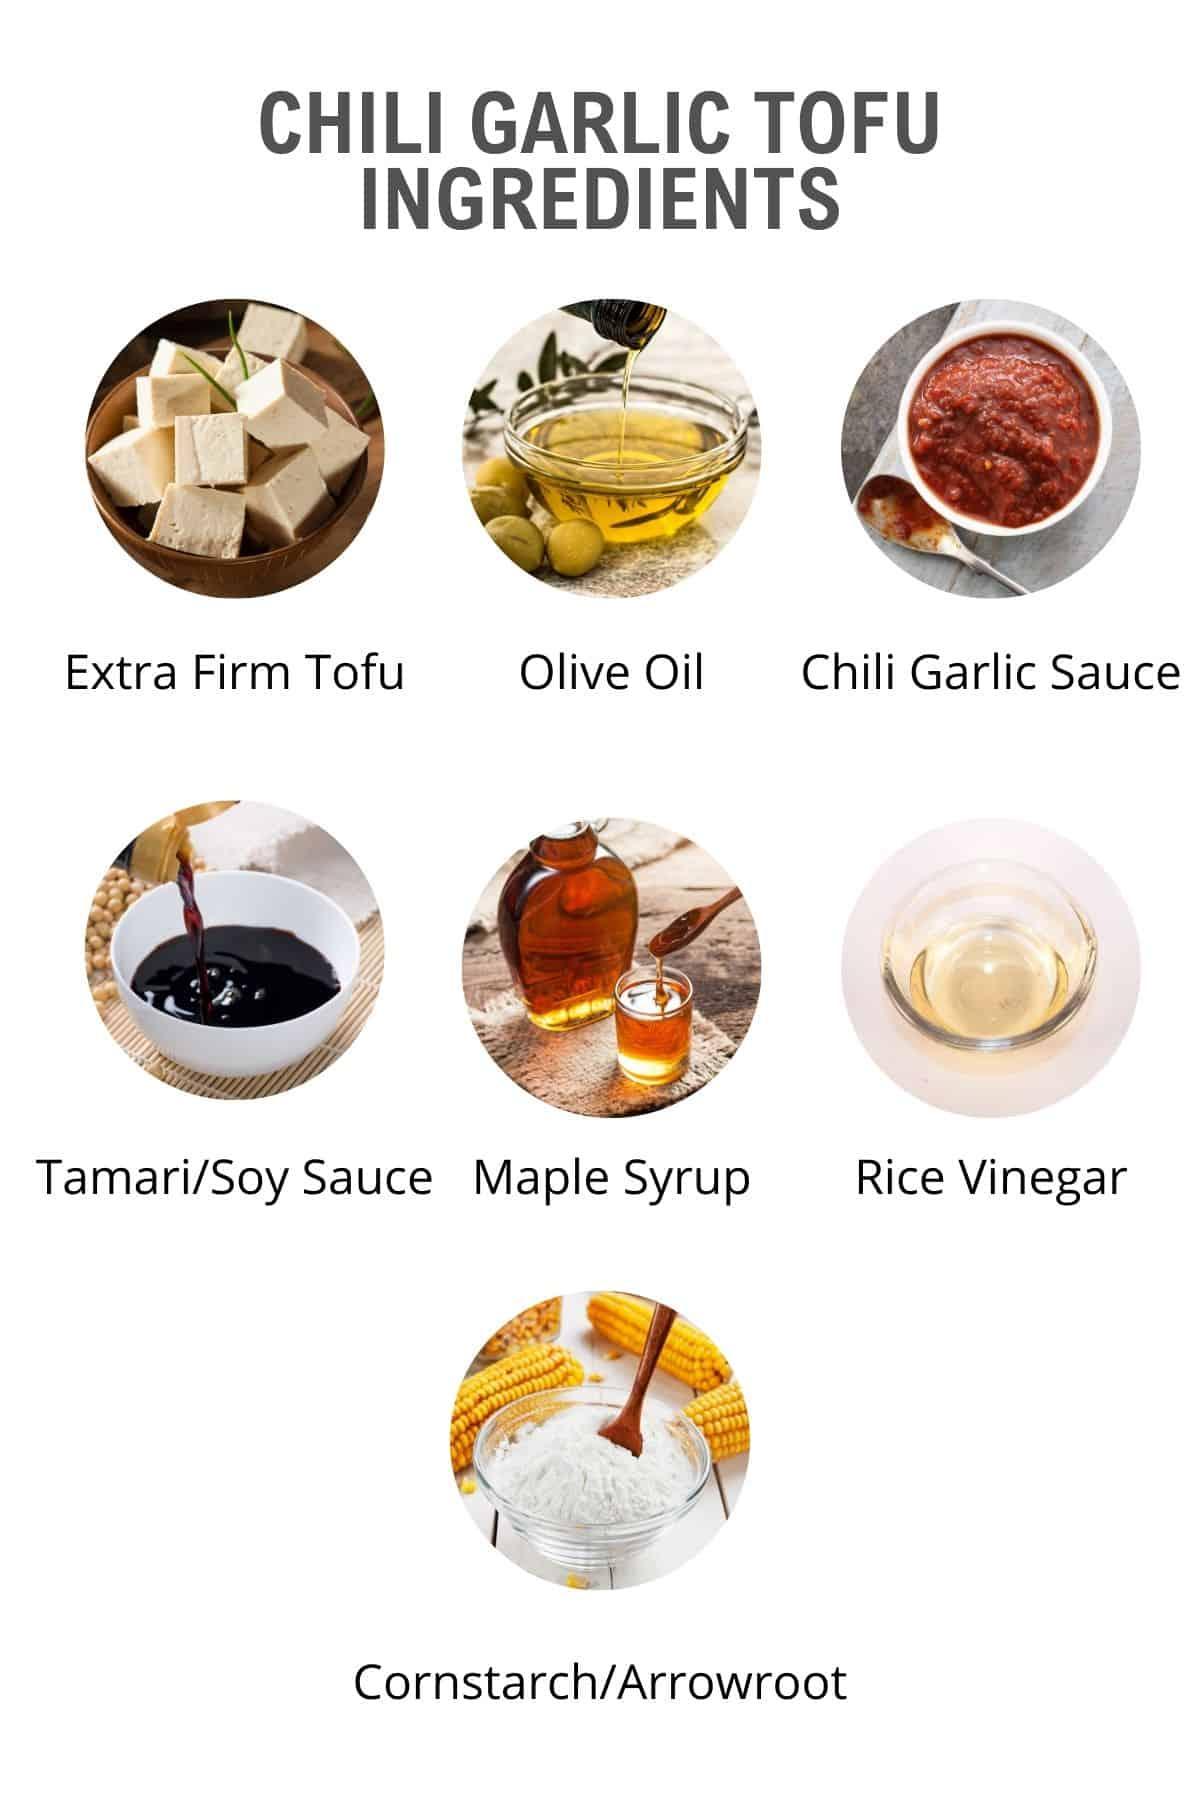 tofu in chili garlic sauce ingredients list, mise en place